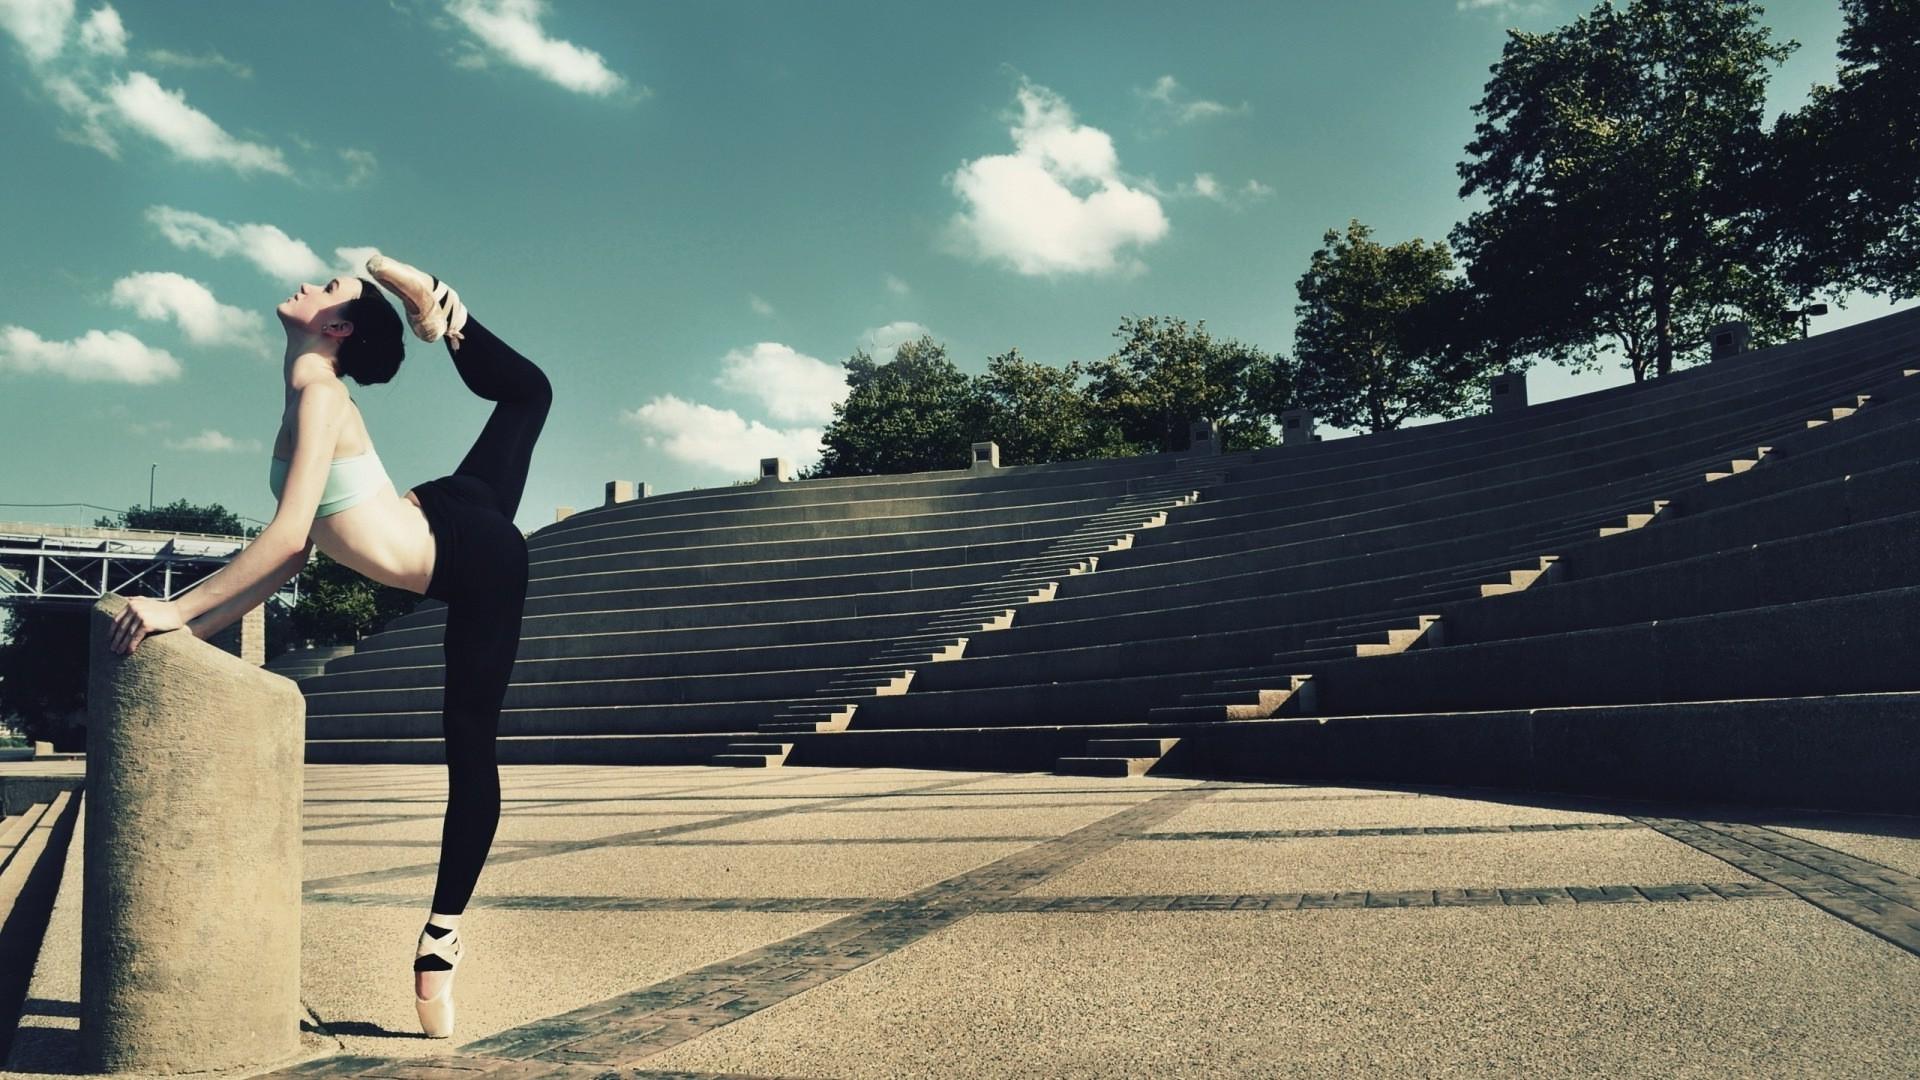 Ballet-dancer-wallpaper-wp3602943